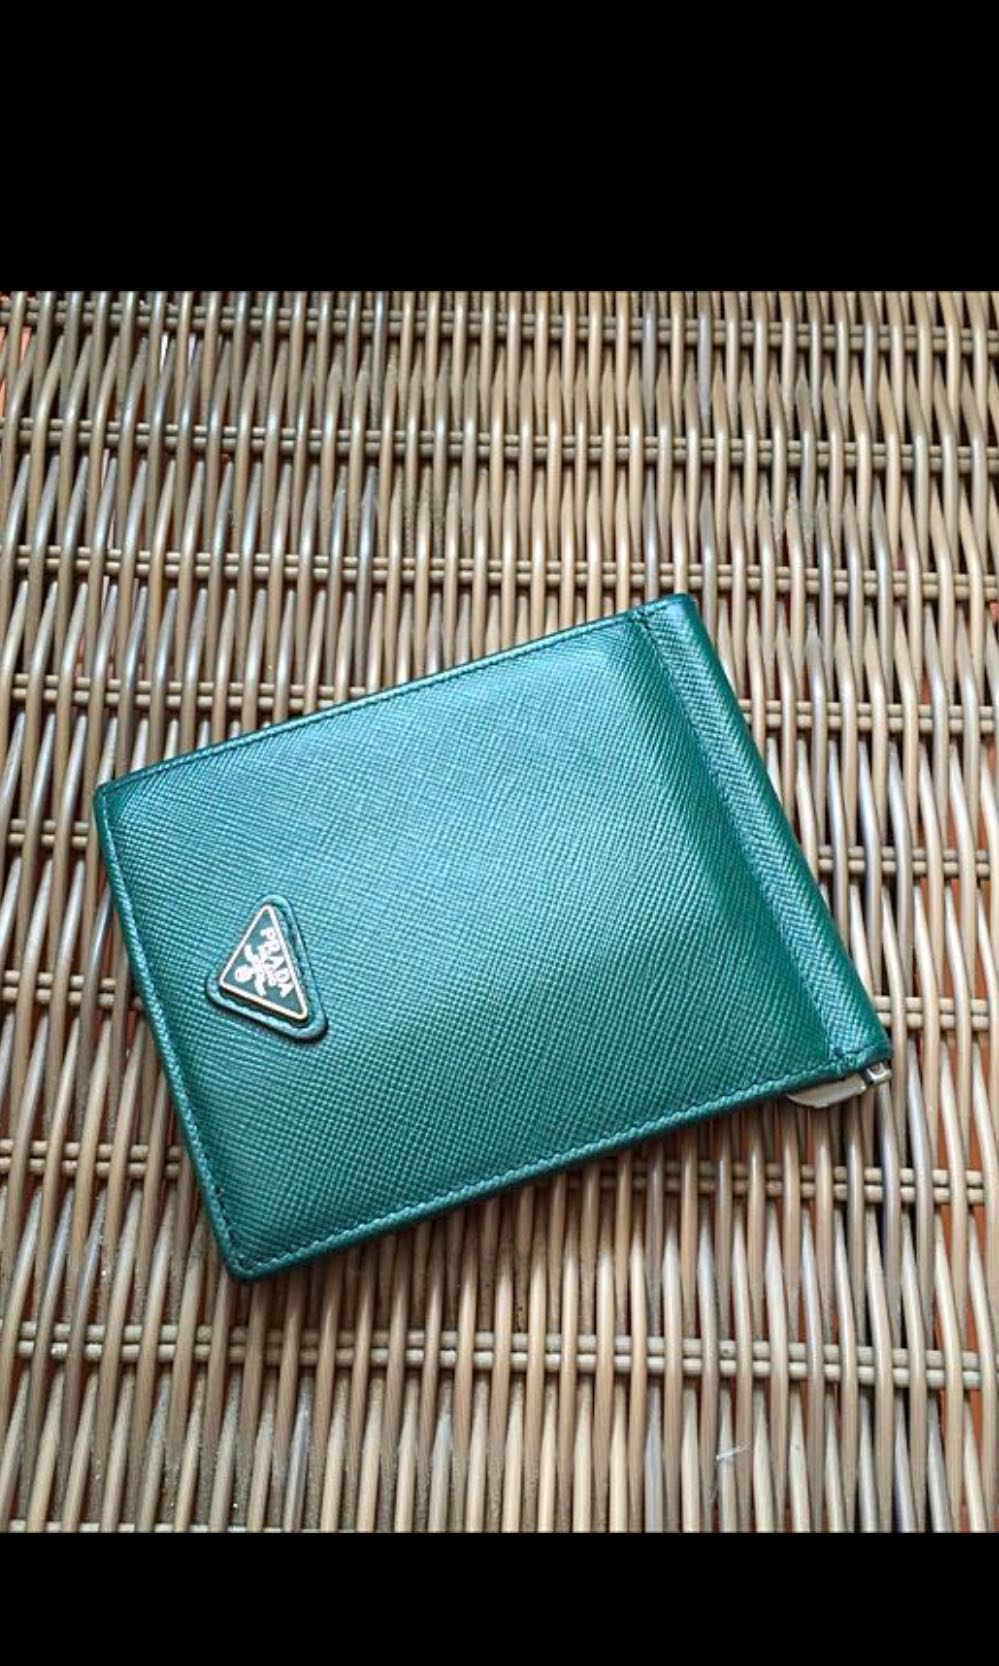 81140a2aae5f Prada money clip wallet, Luxury, Bags & Wallets, Wallets on Carousell